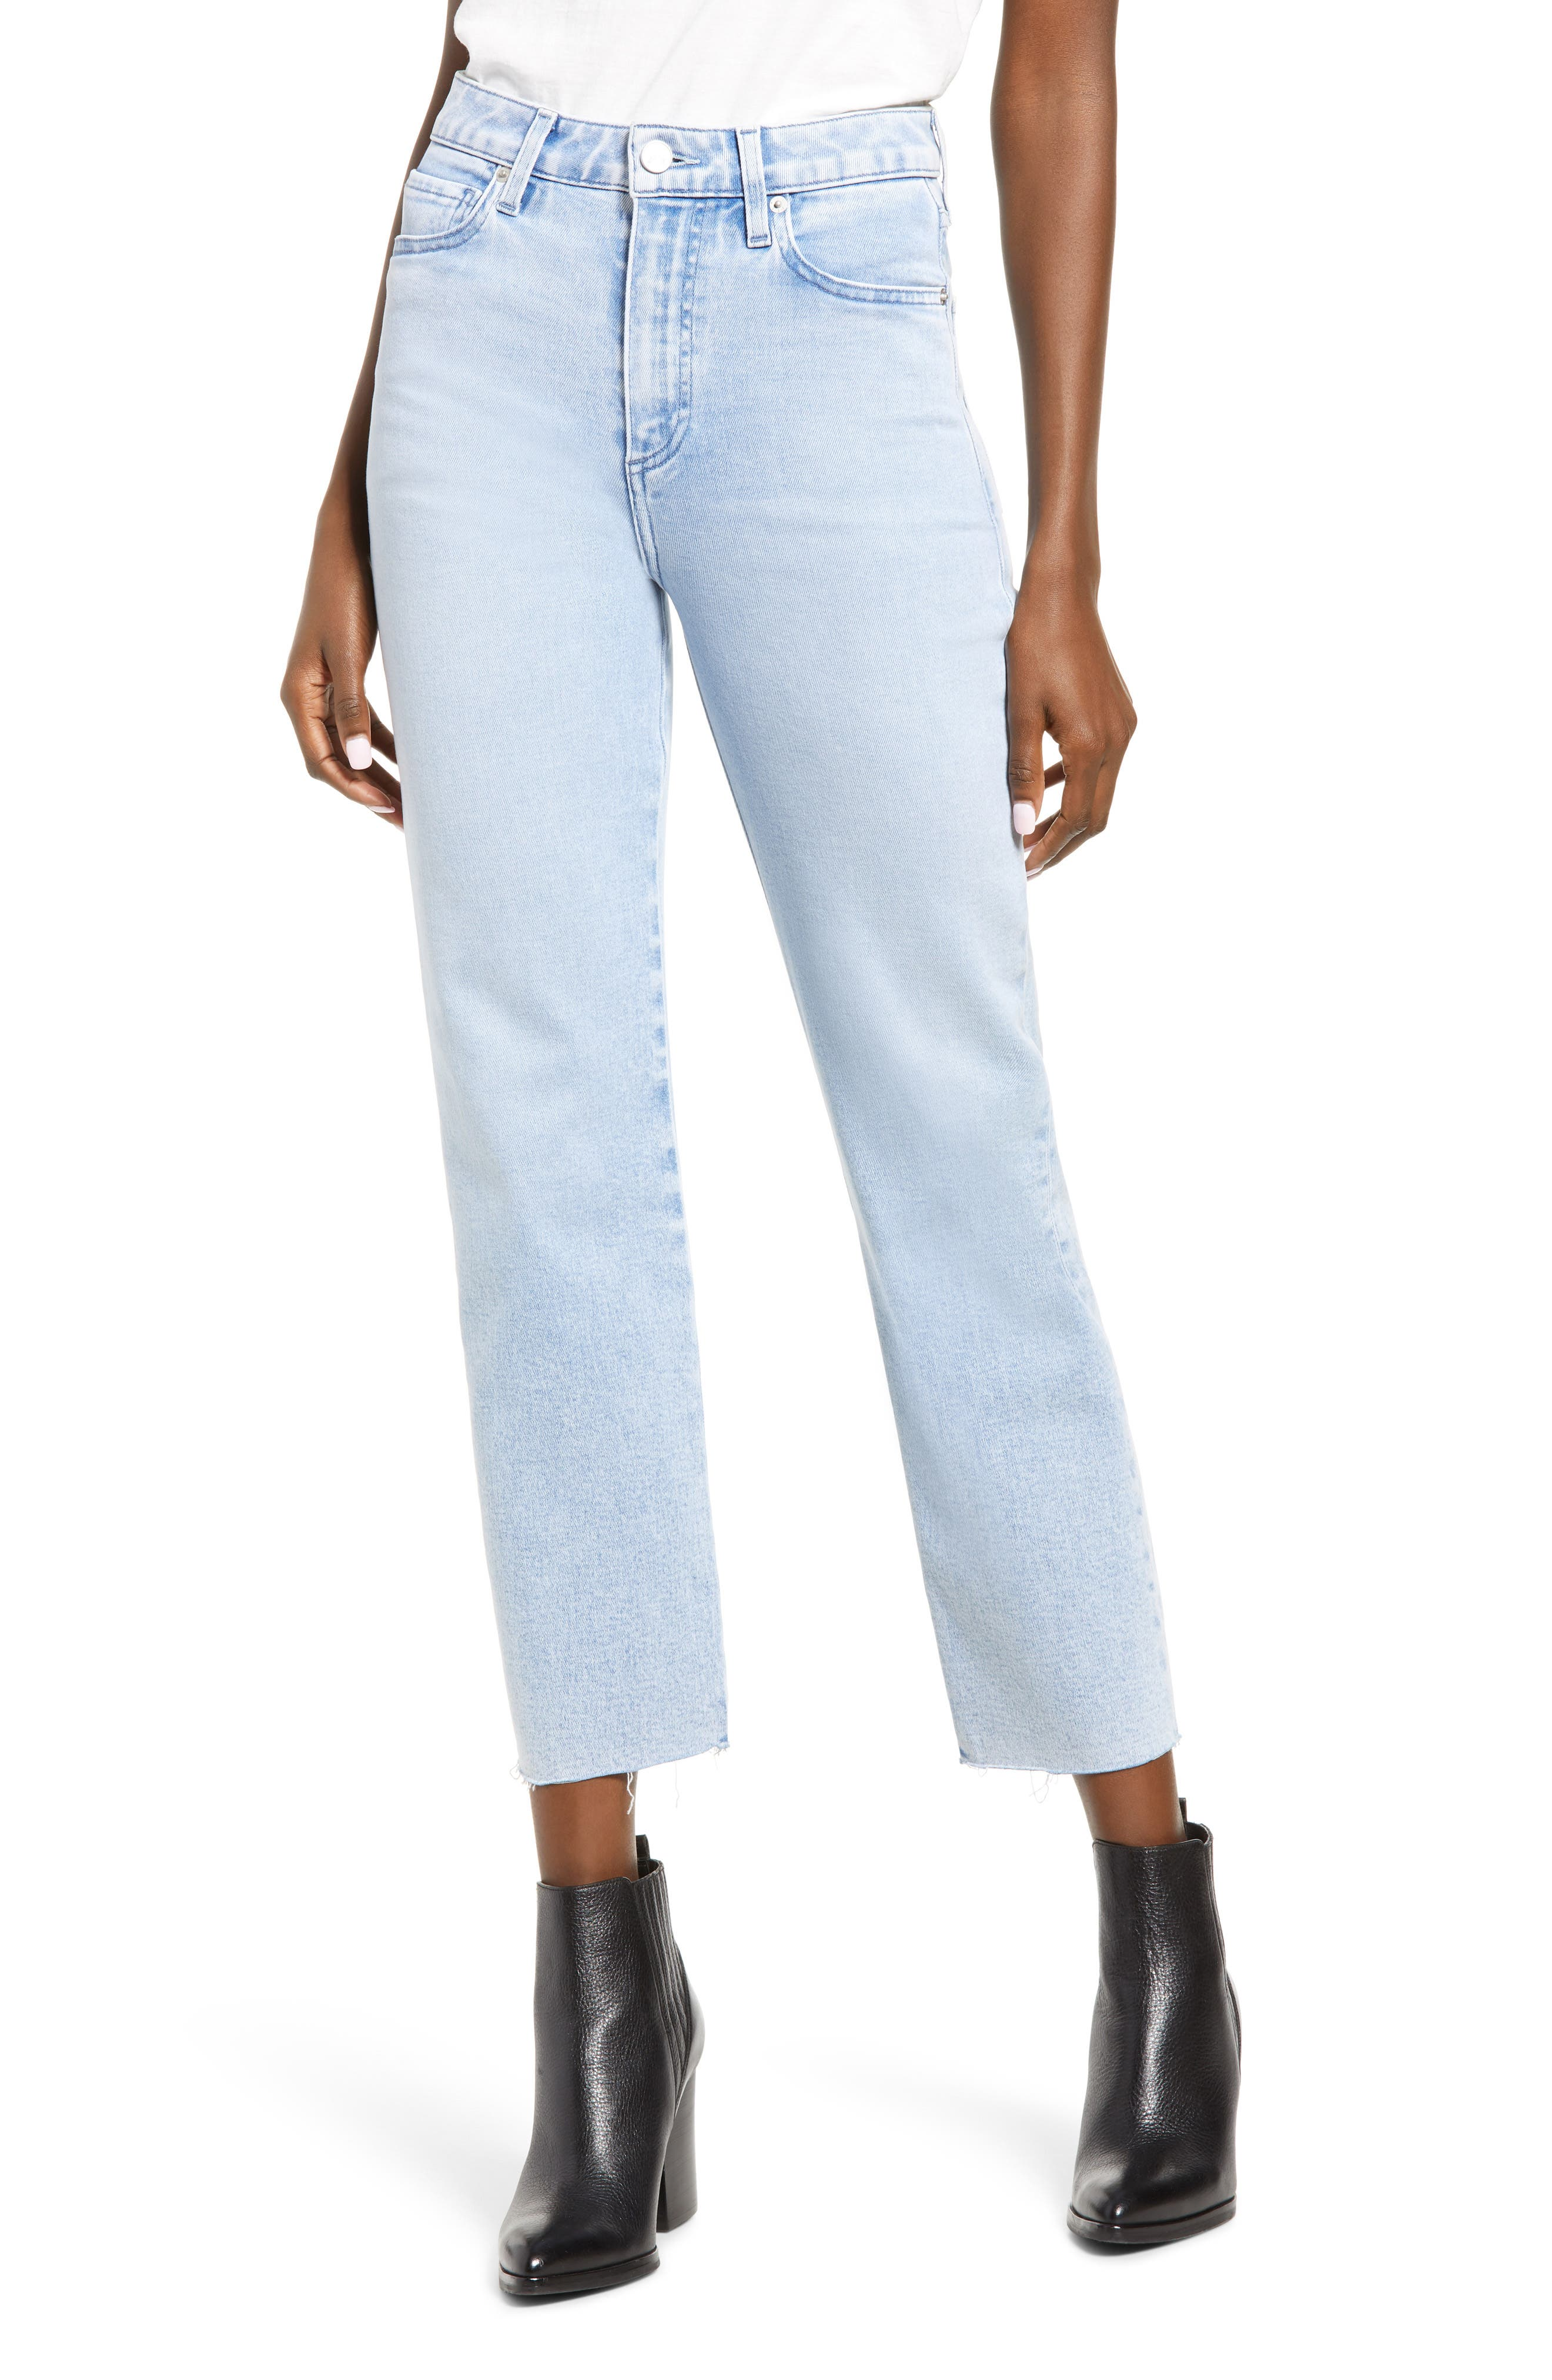 Sabine High Waist Raw Hem Ankle Straight Leg Jeans